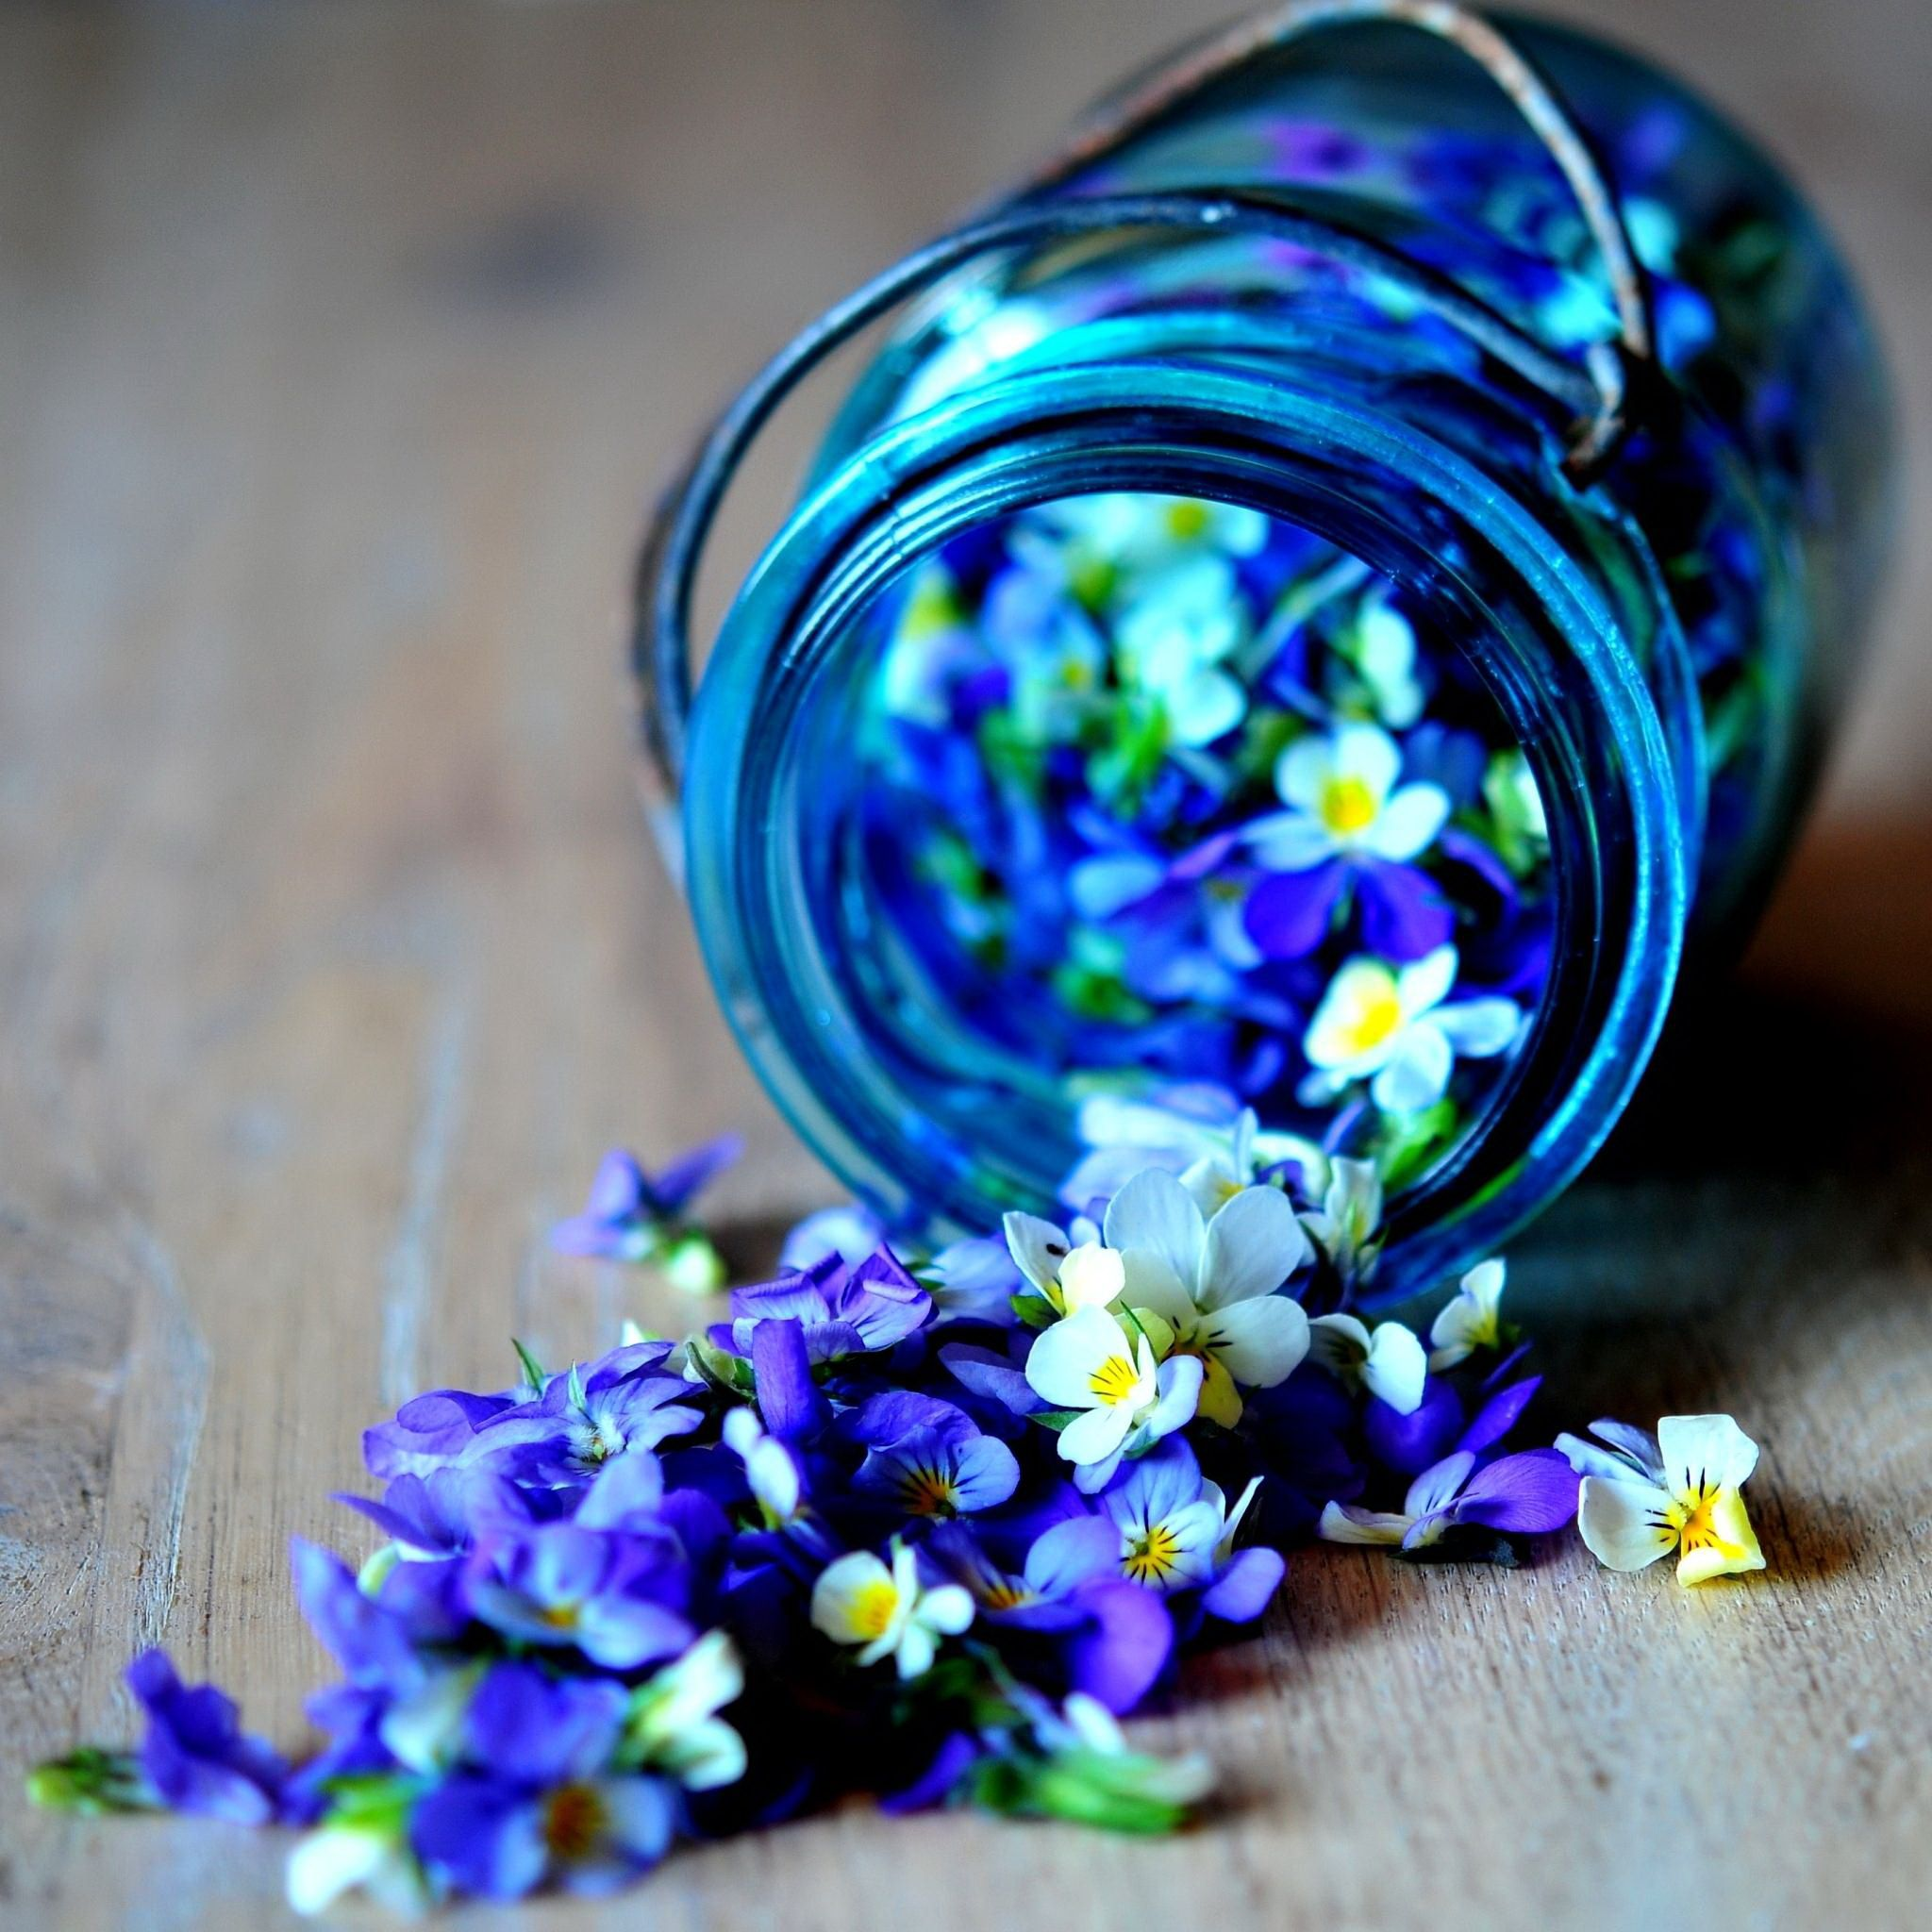 My Ipad Retina Wallpaper The One I Just Liked Beautiful Flowers Flowers Purple Flowers